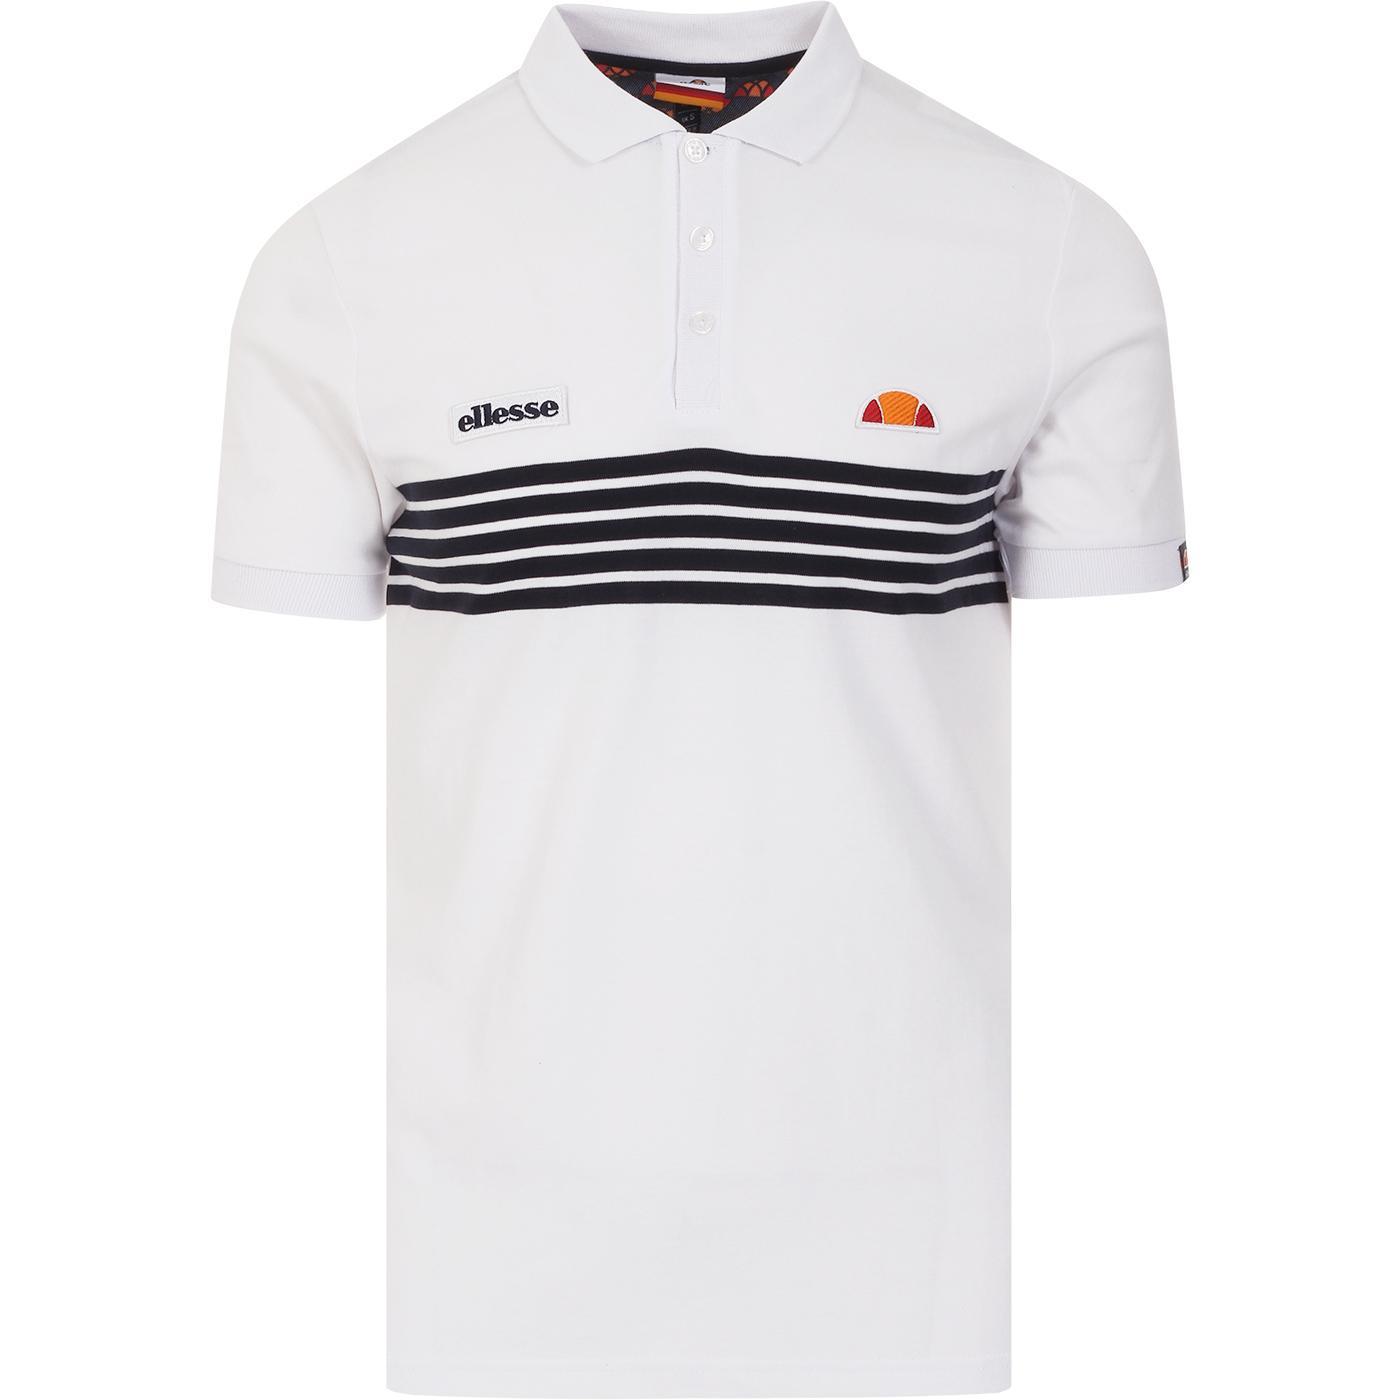 Vanni ELLESSE Retro 80s Stripe Polo Shirt (White)